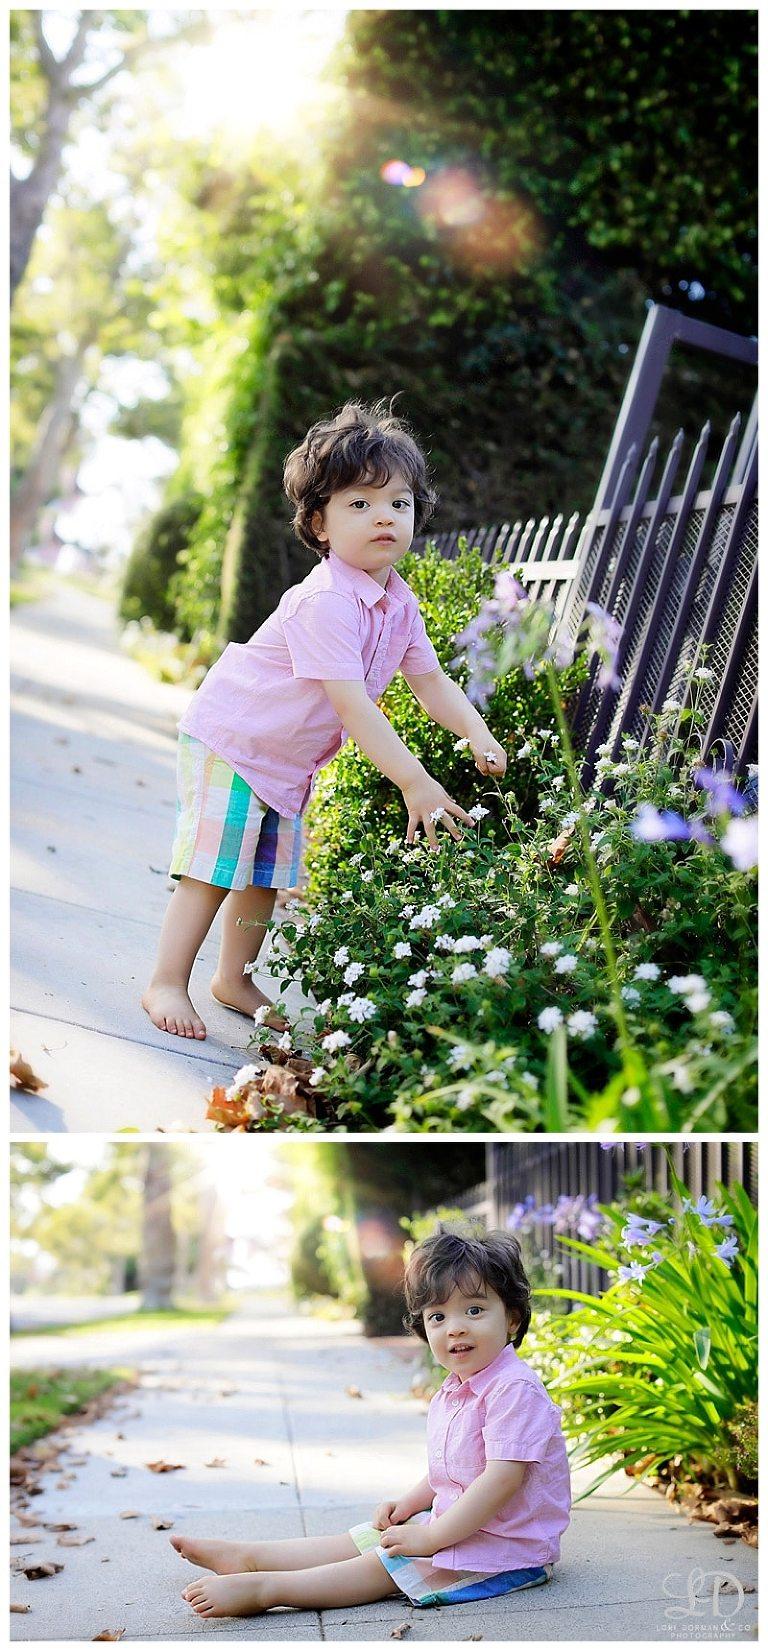 adorable family photoshoot-bright fun family shoot-lori dorman photography-twin shoot_0131.jpg